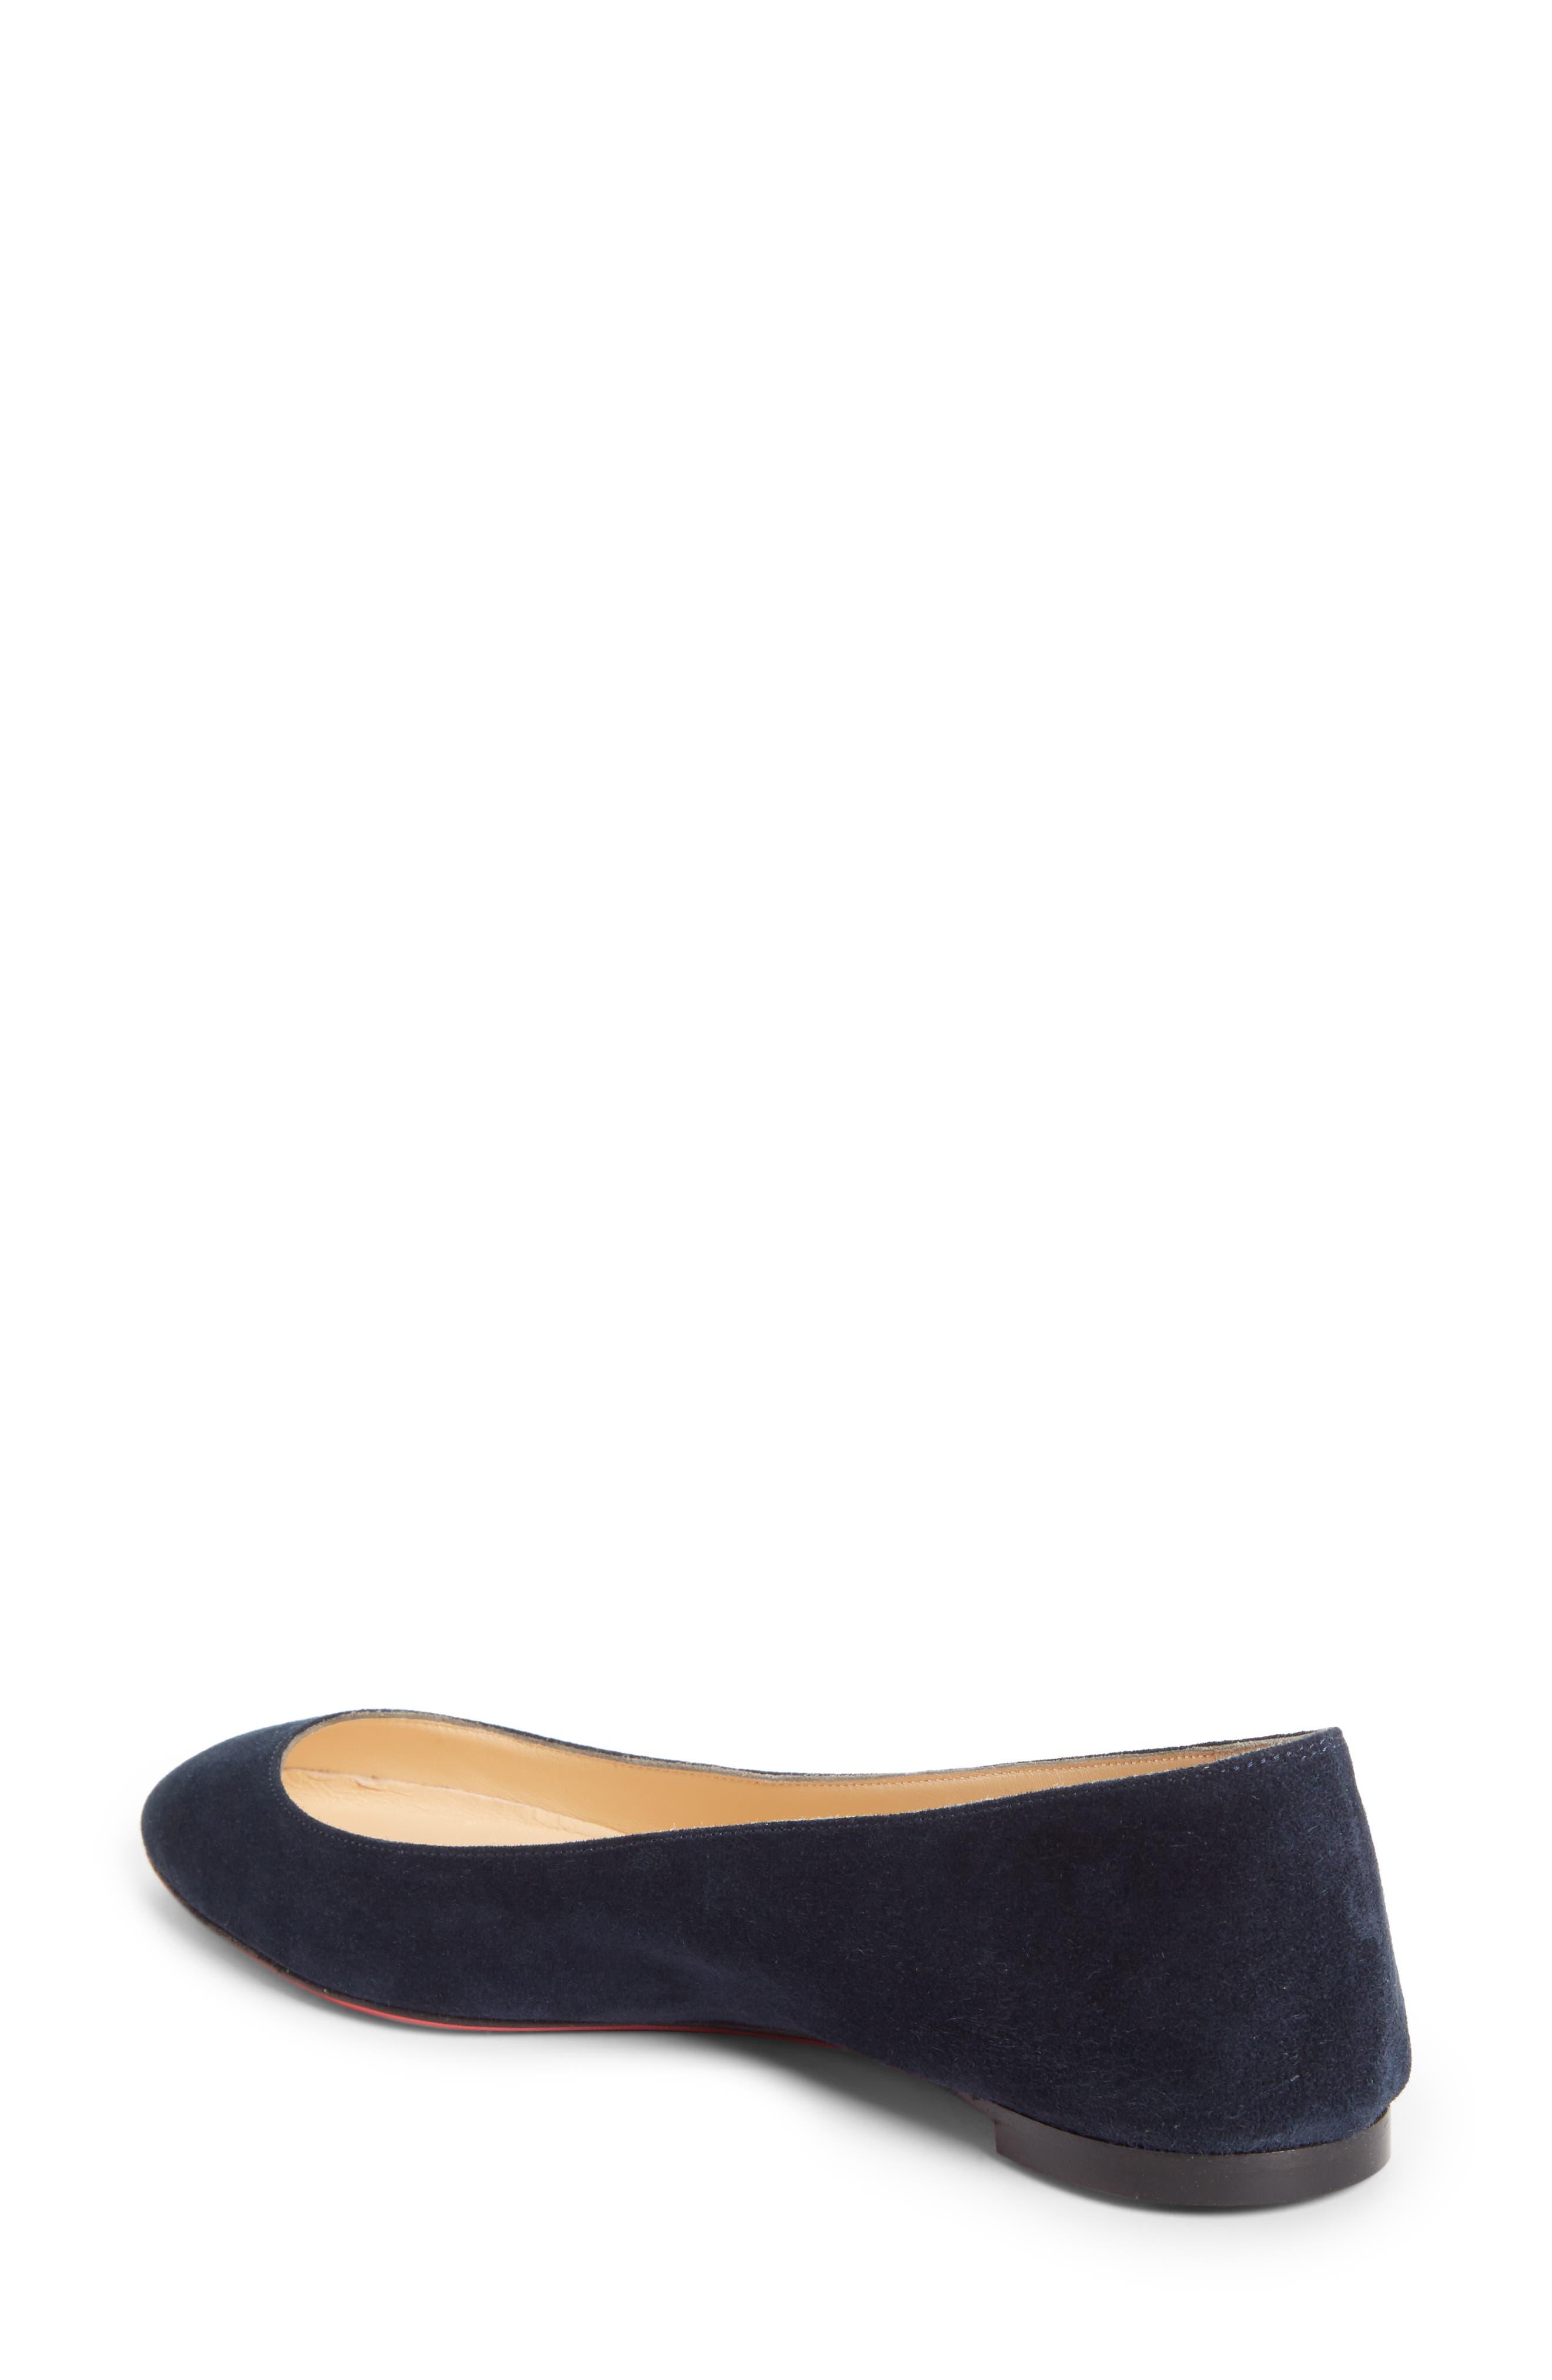 Ballet Flats Ballerina Shoes for Women On Sale, White, Leather, 2017, 3.5 4 5.5 6 6.5 7.5 Prada